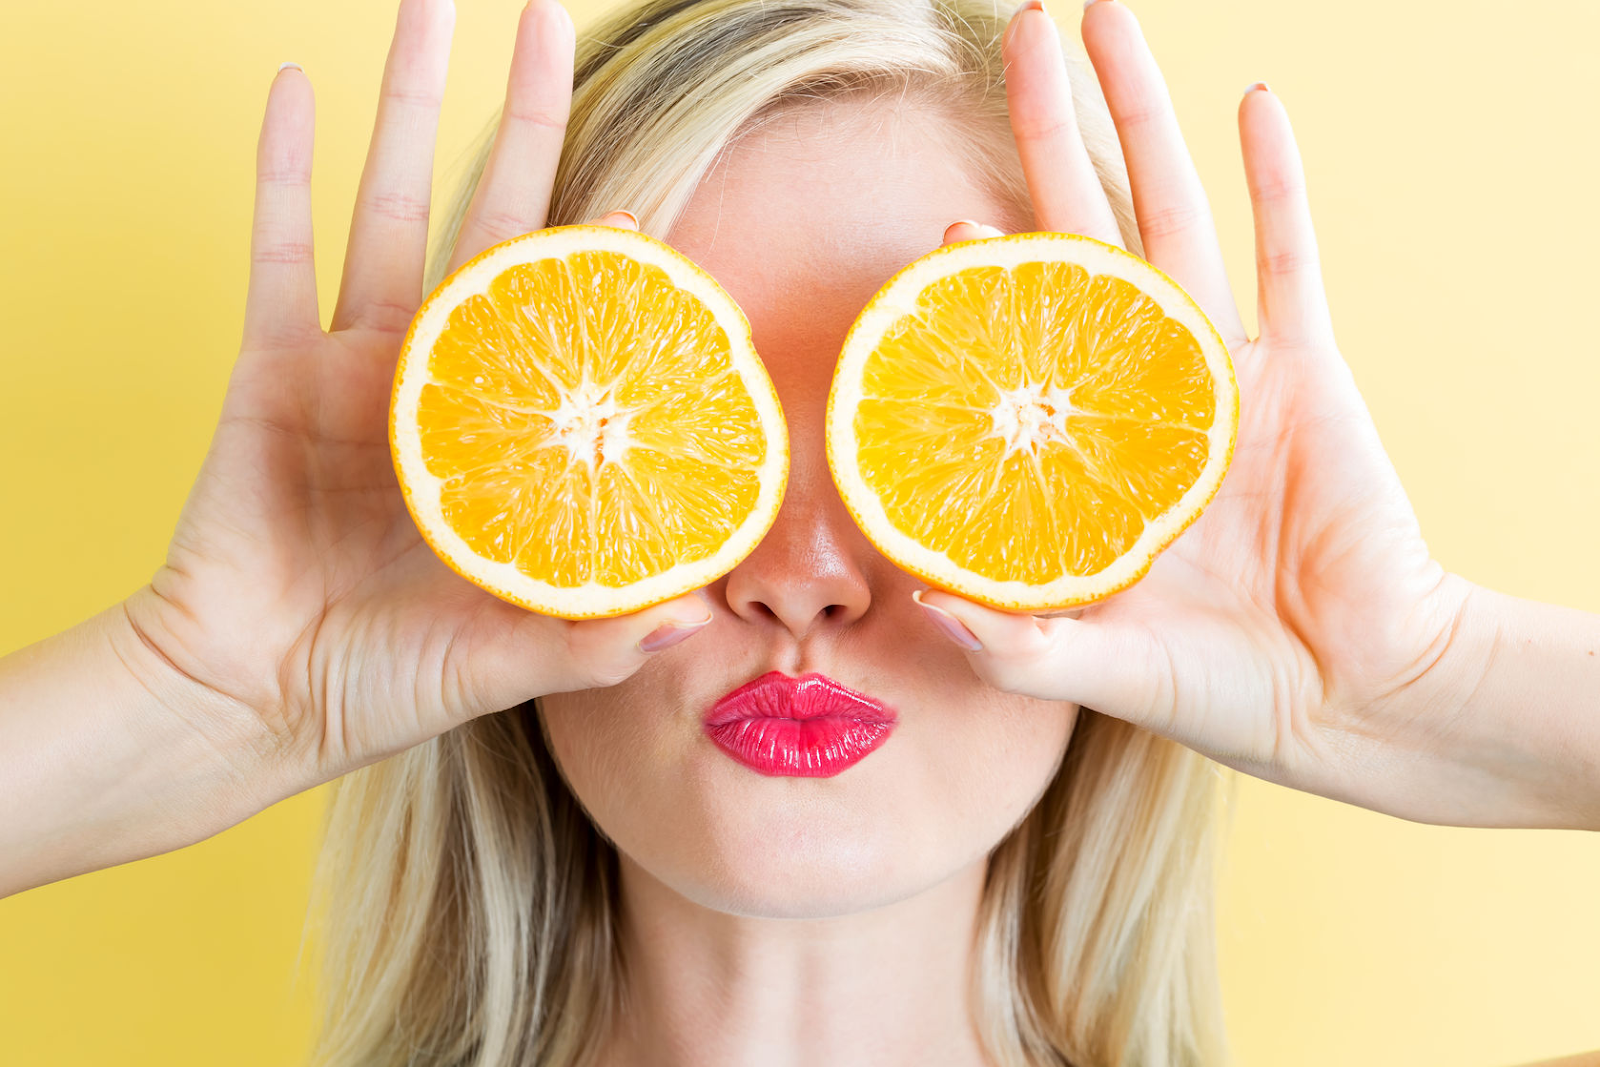 woman holding oranges